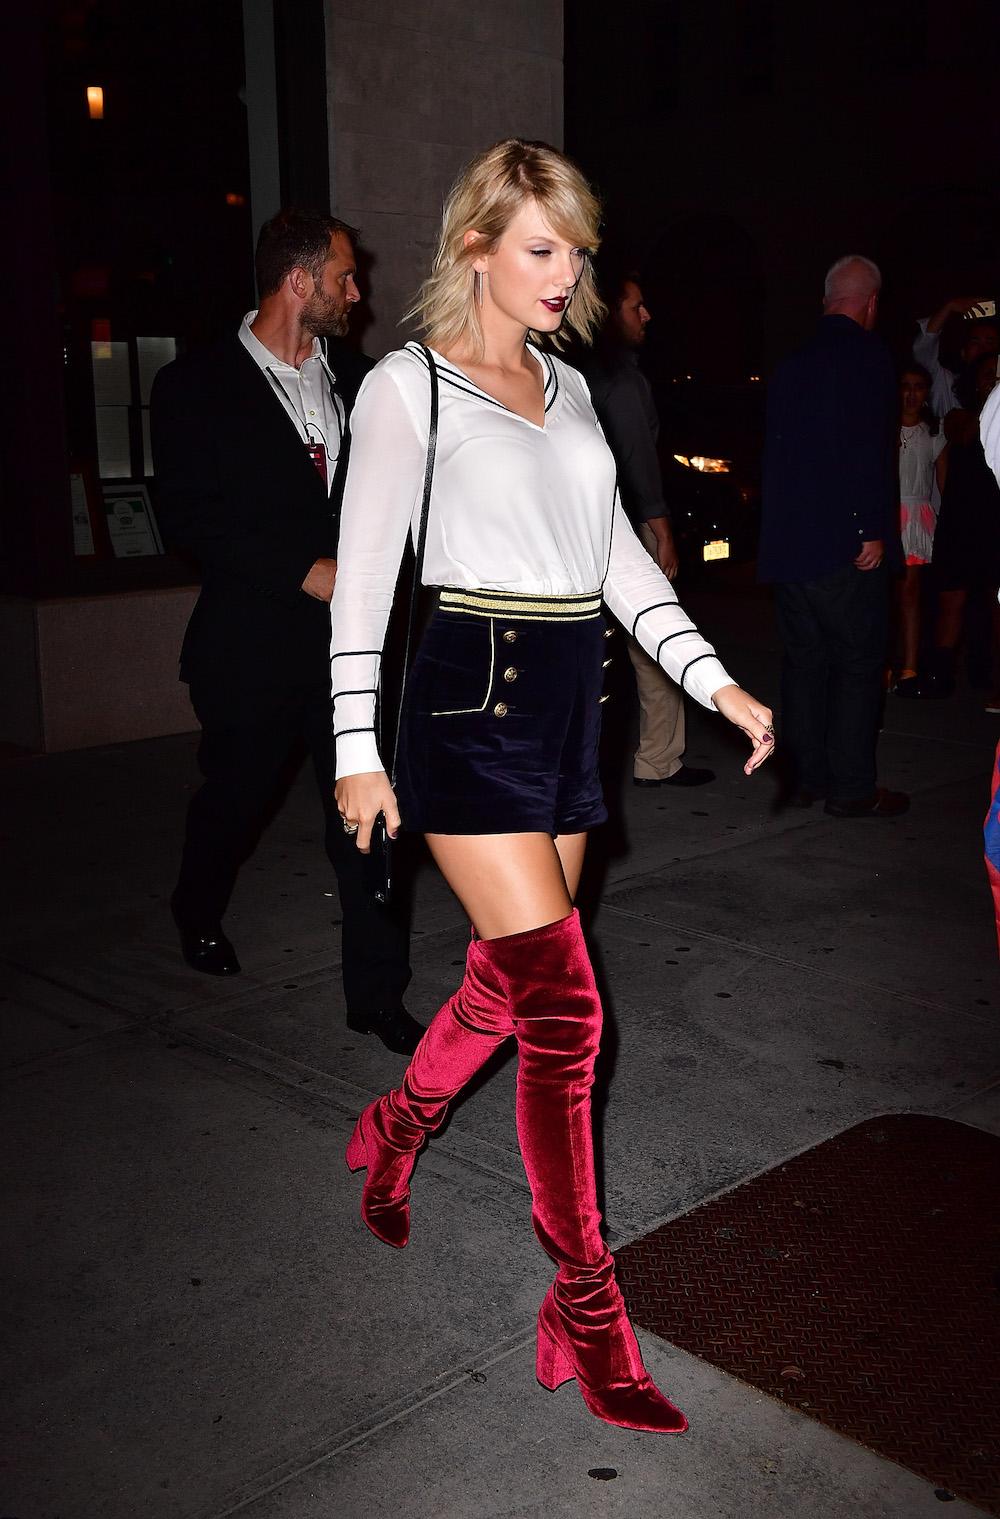 Taylor-Swift-Velvet-Boots-cred.-James-Devaney-Getty-Images.jpg